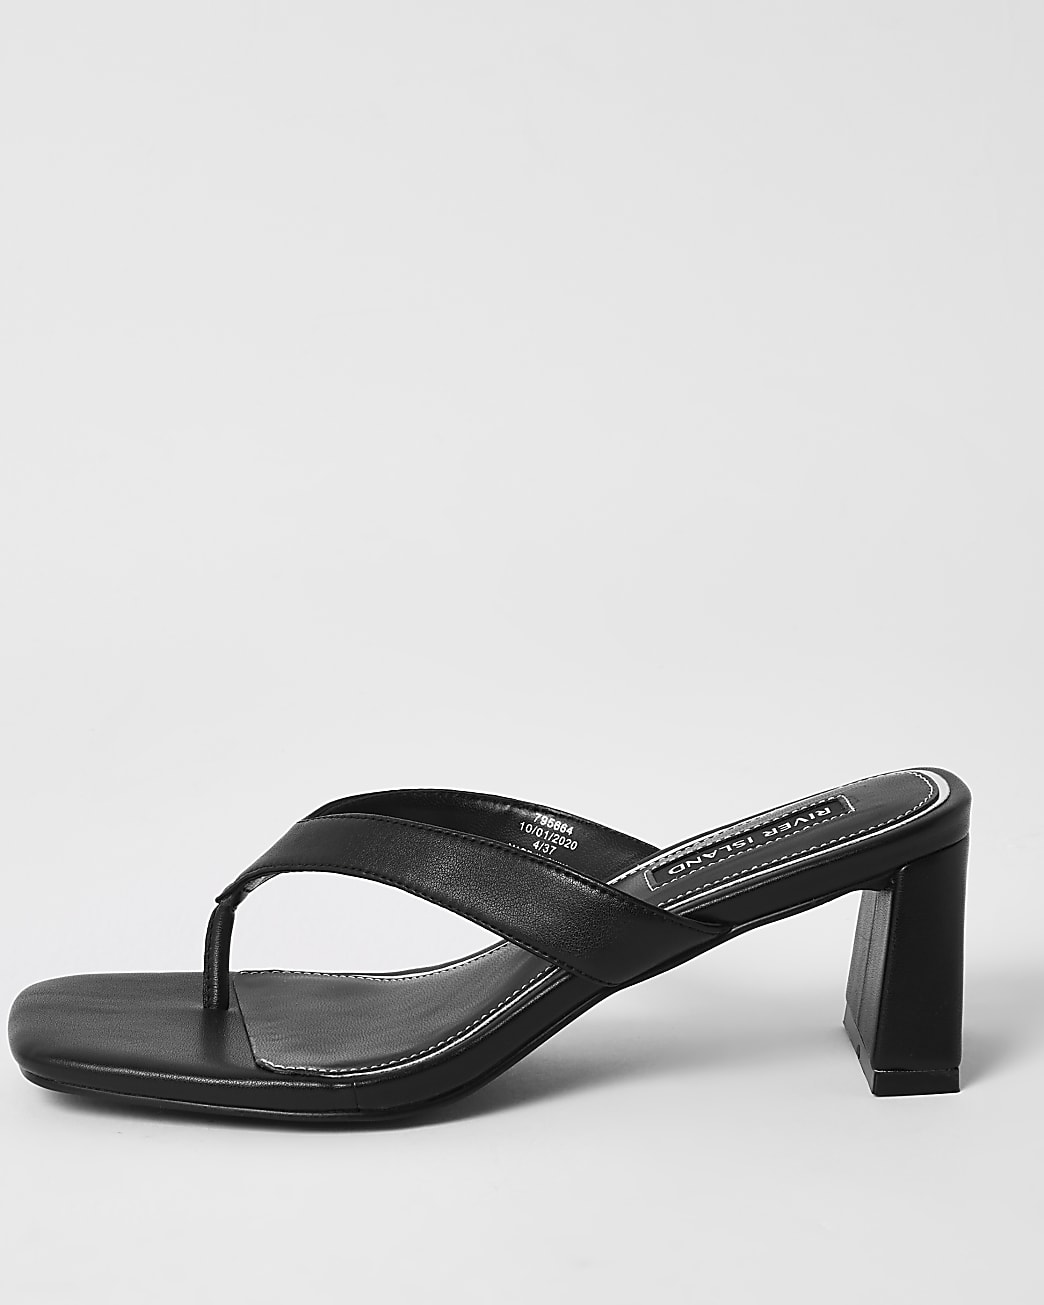 Black toe thong block heel sandals